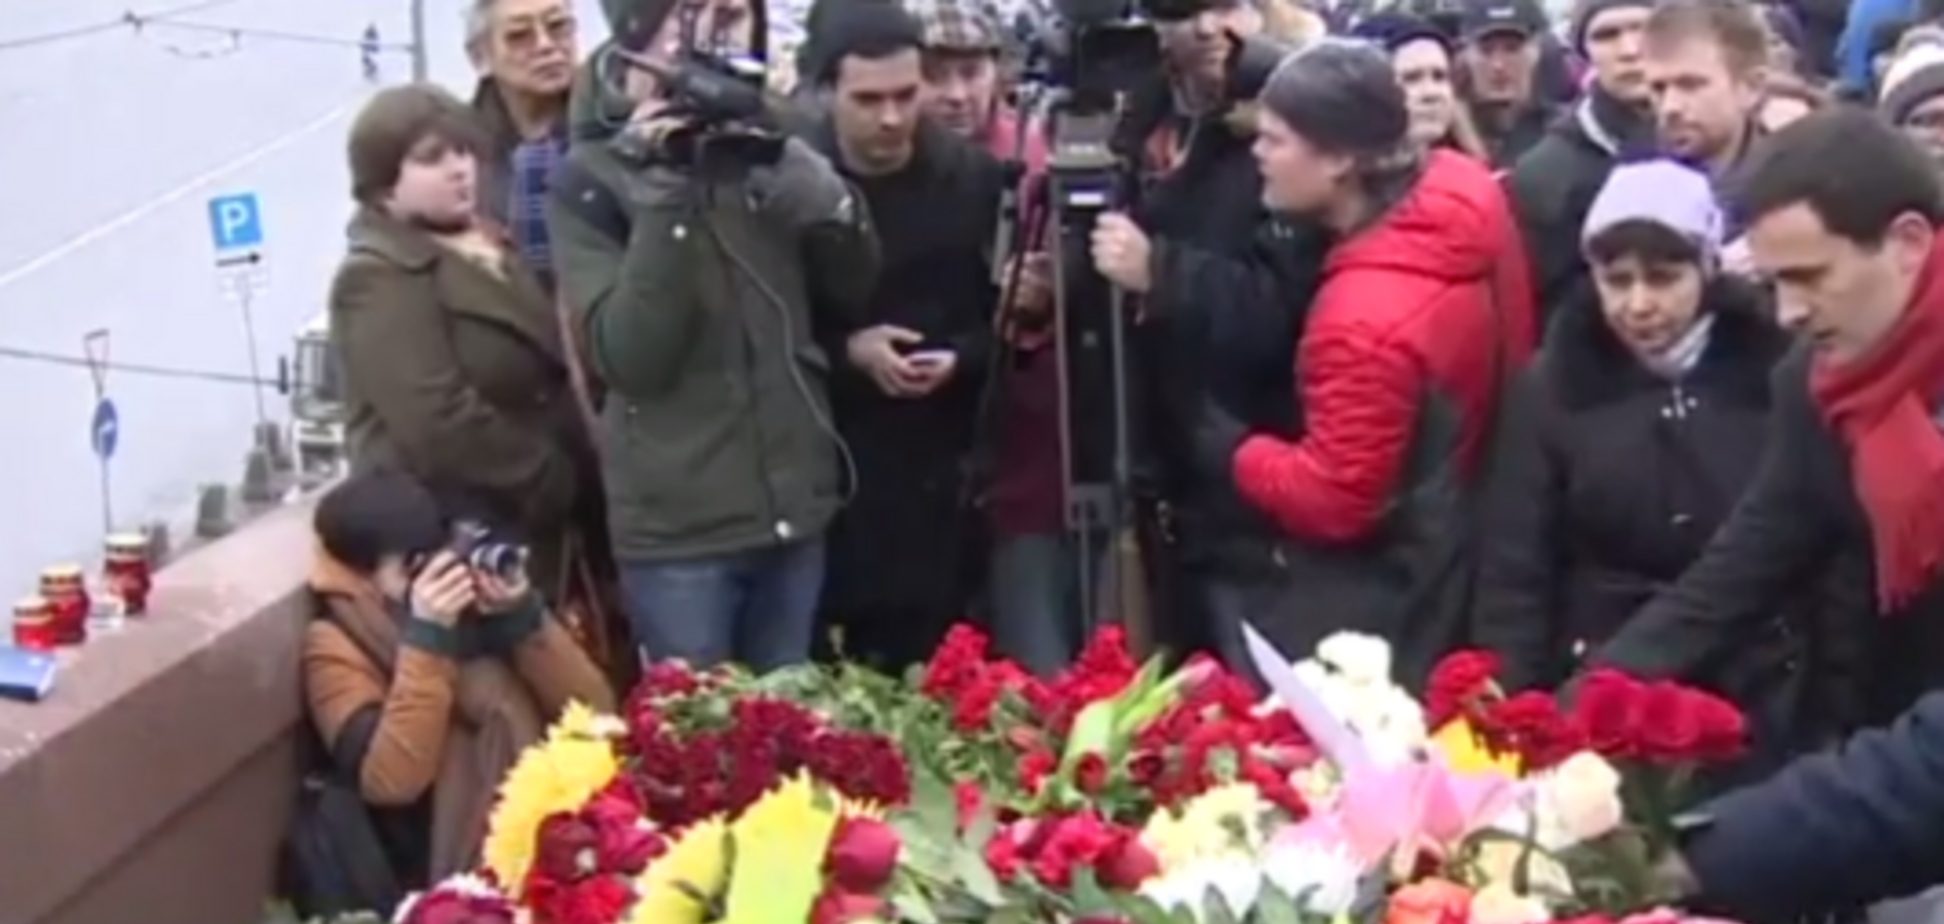 В Москве началась траурная акция в память о Немцове – онлайн-трансляция